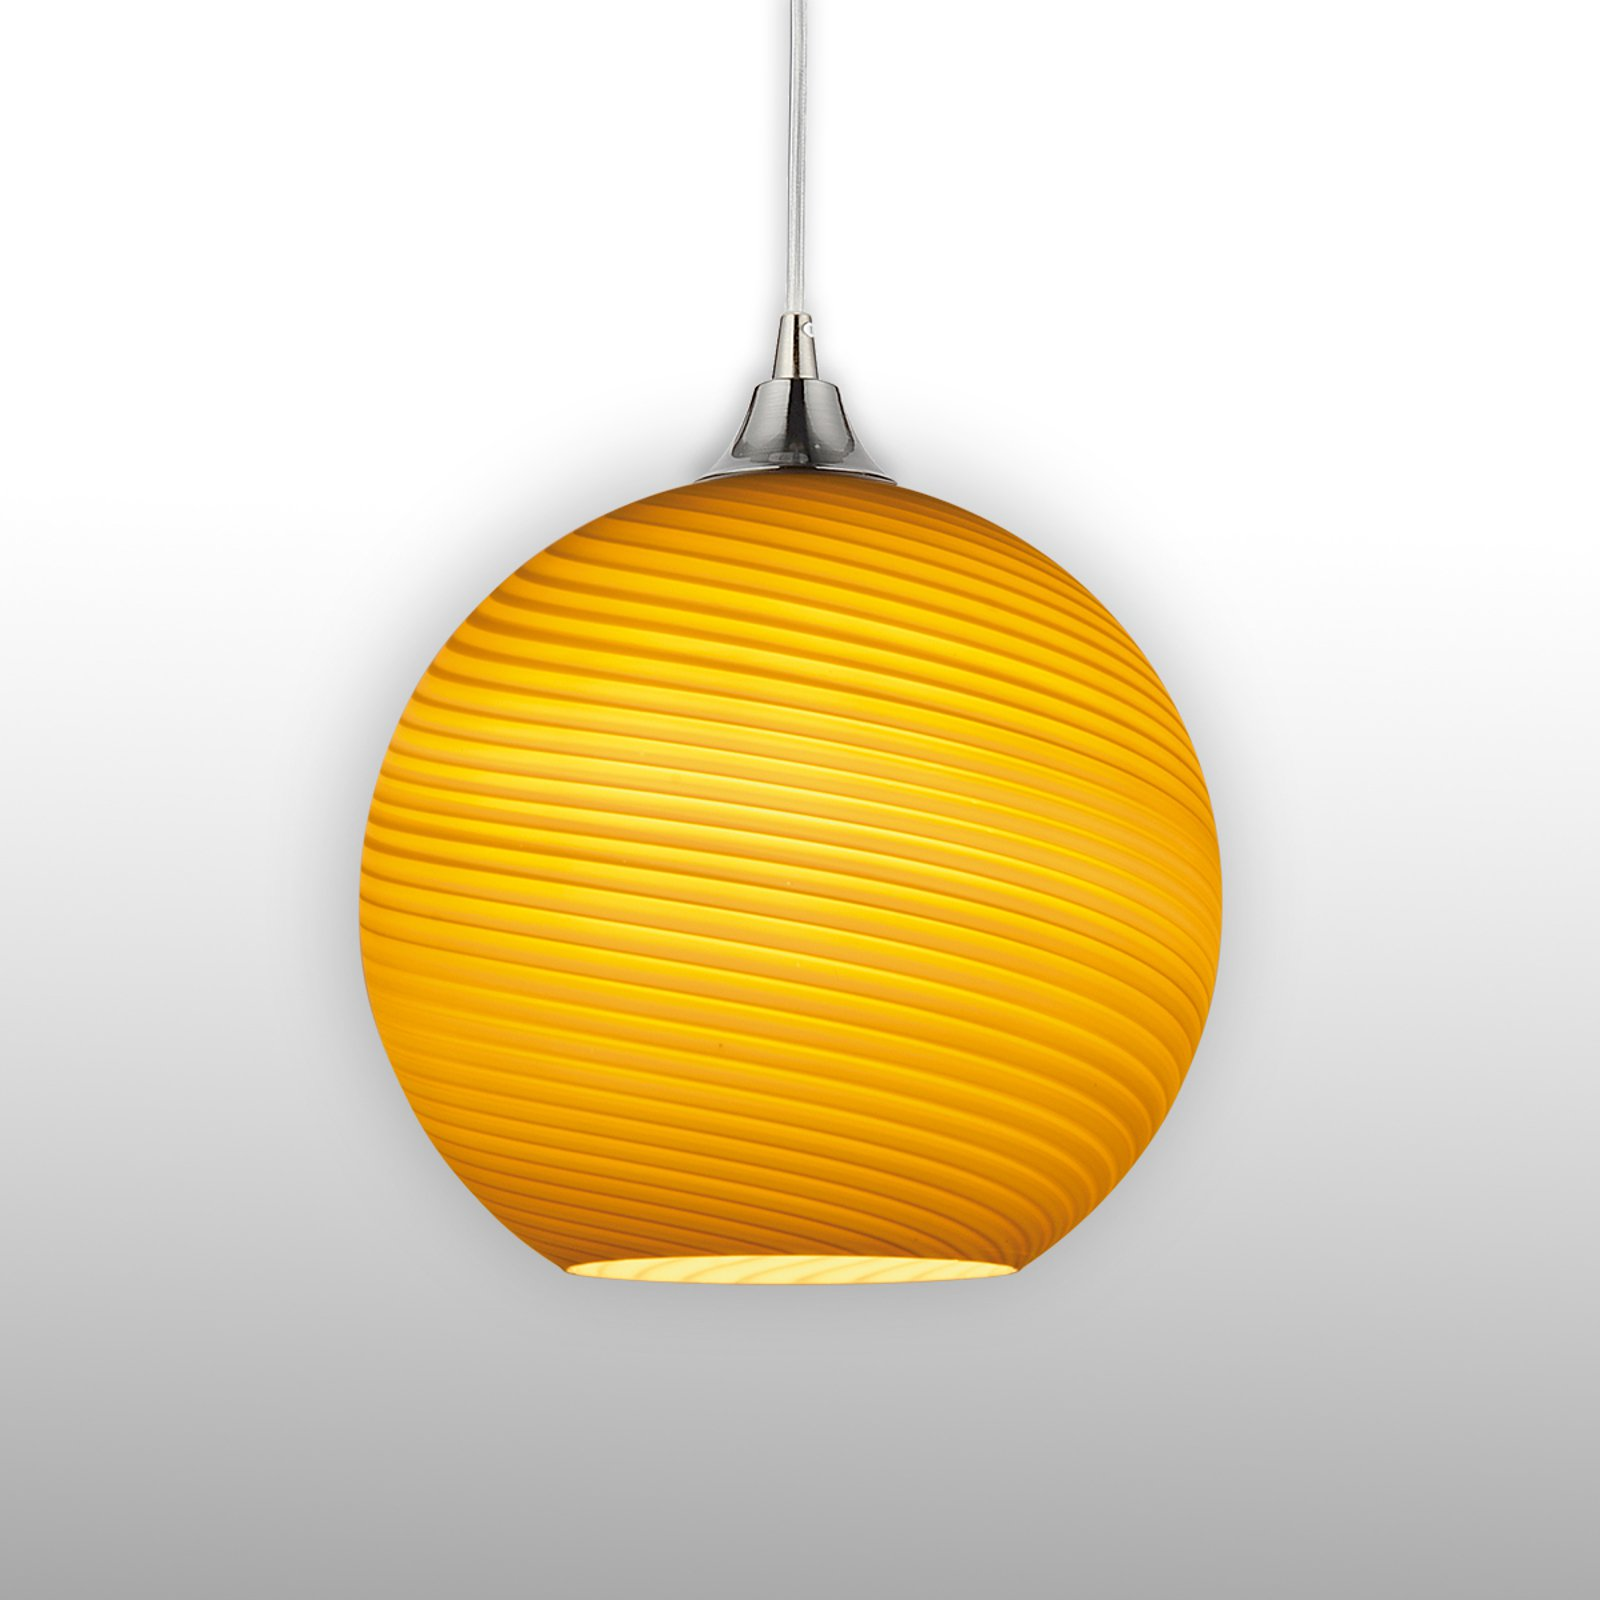 Vidunderlig taklampe Venus - 20 cm